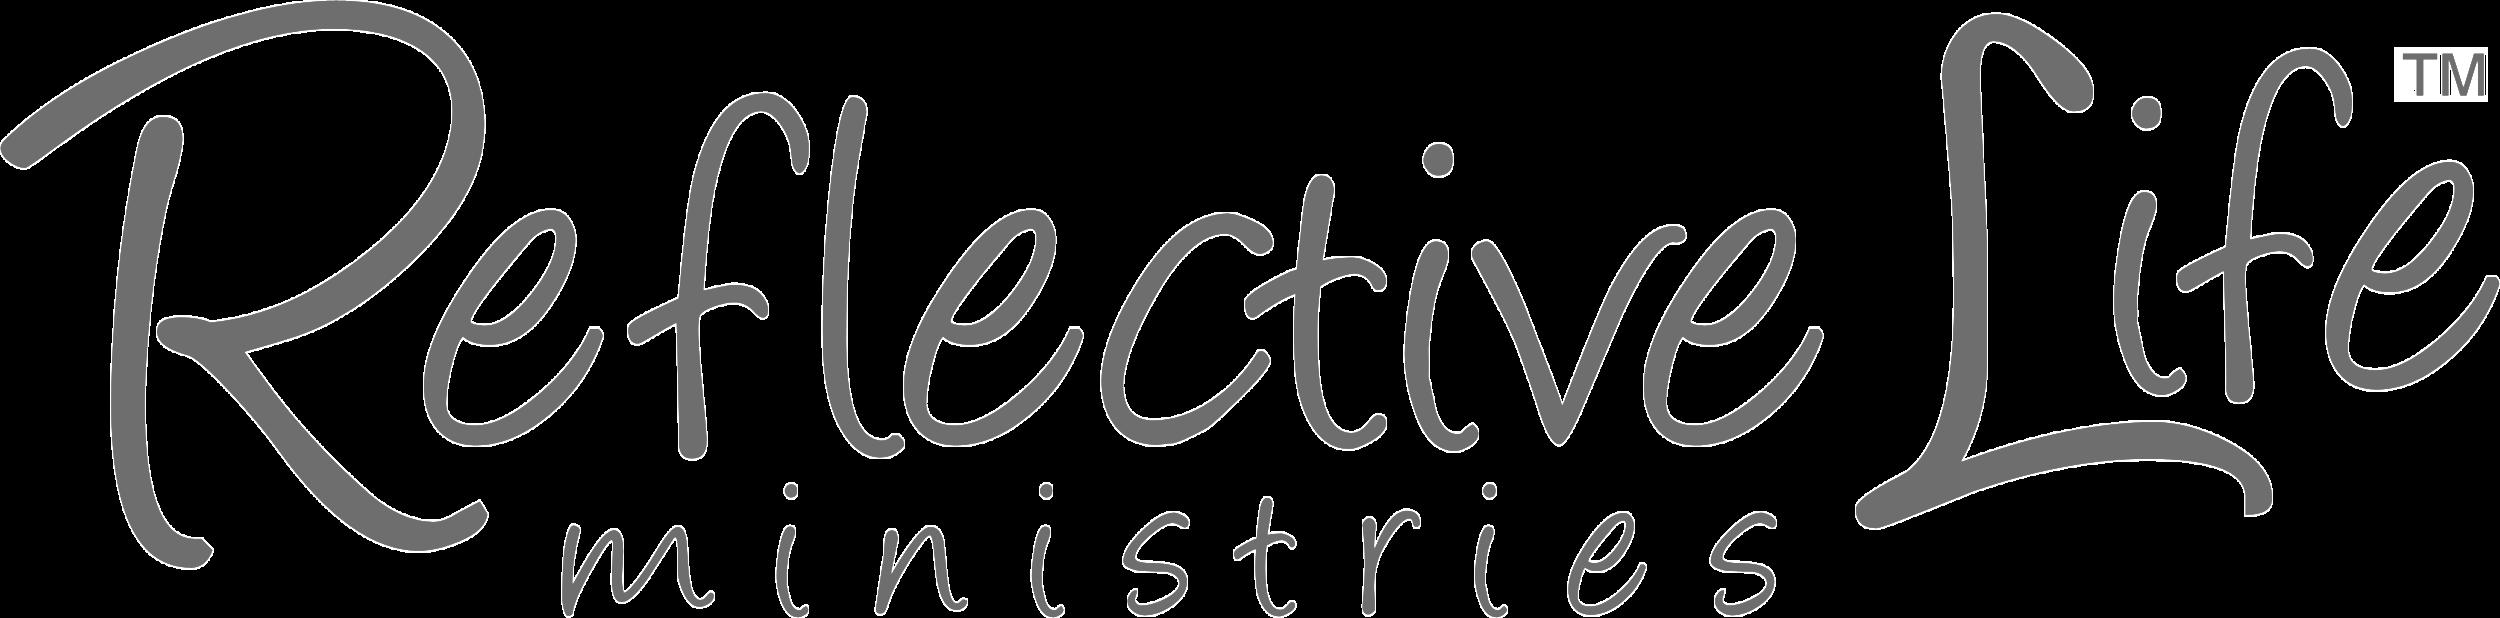 RLM-Logo-Text grey.png